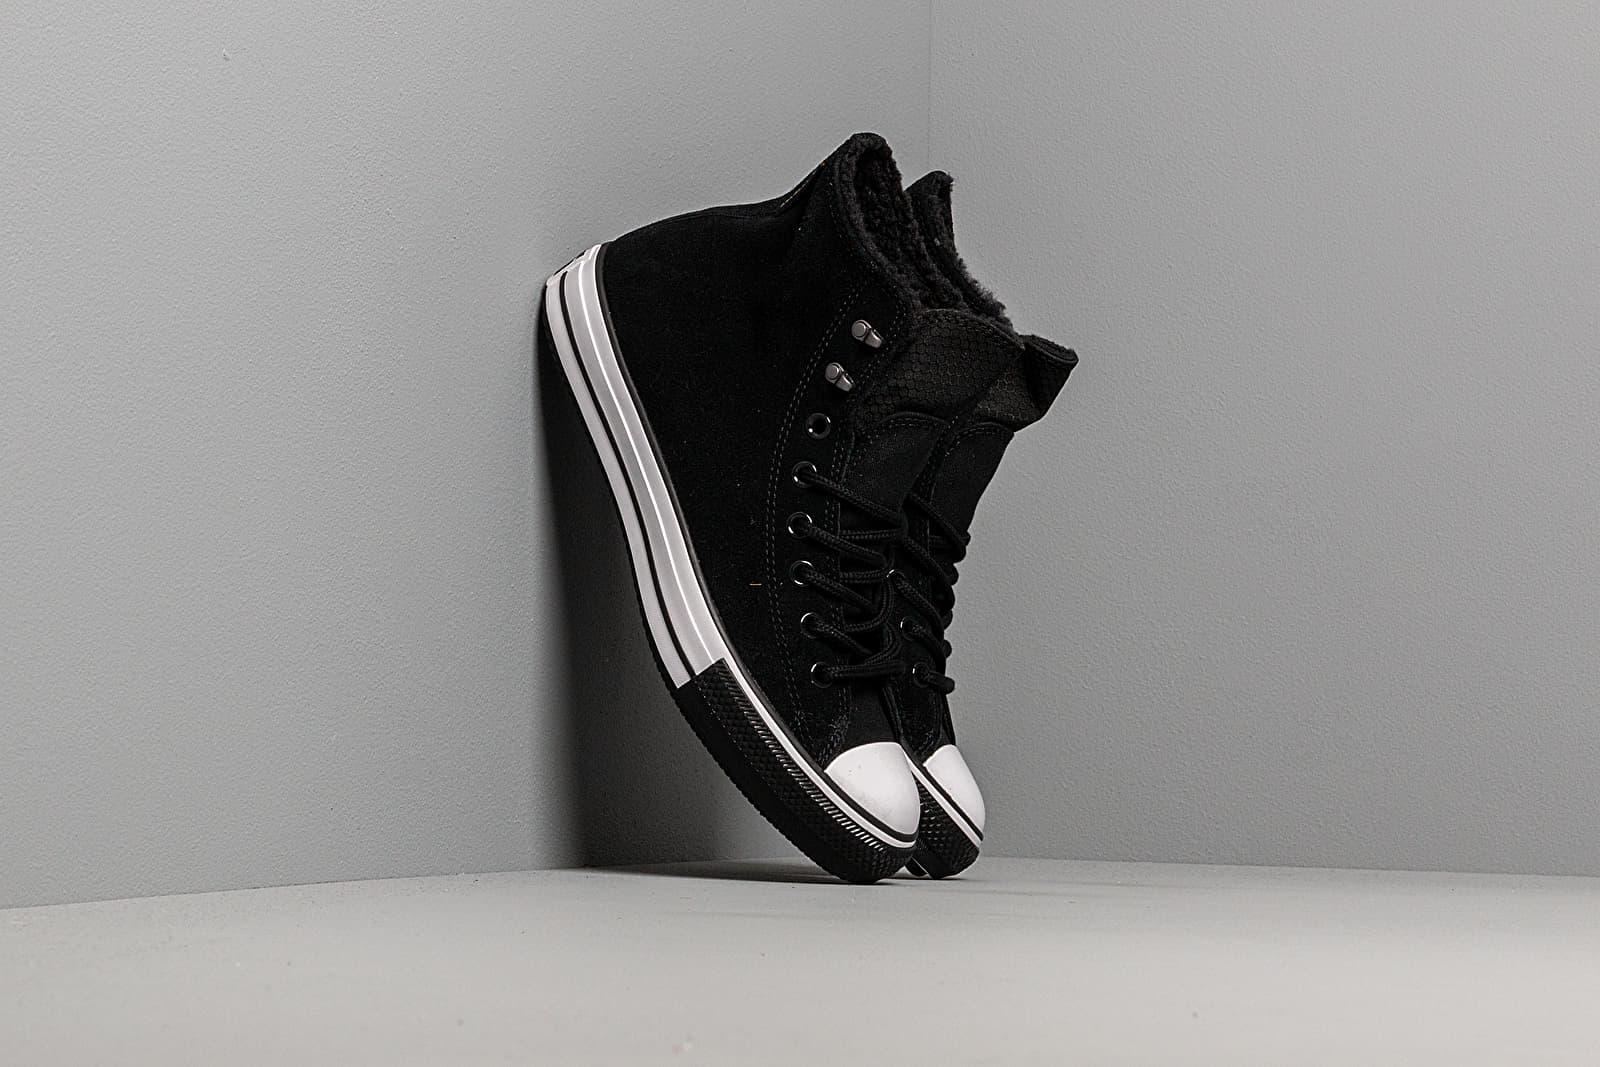 Pánske tenisky a topánky Converse Chuck Taylor All Star Winter Waterproof Black/ White/ Black